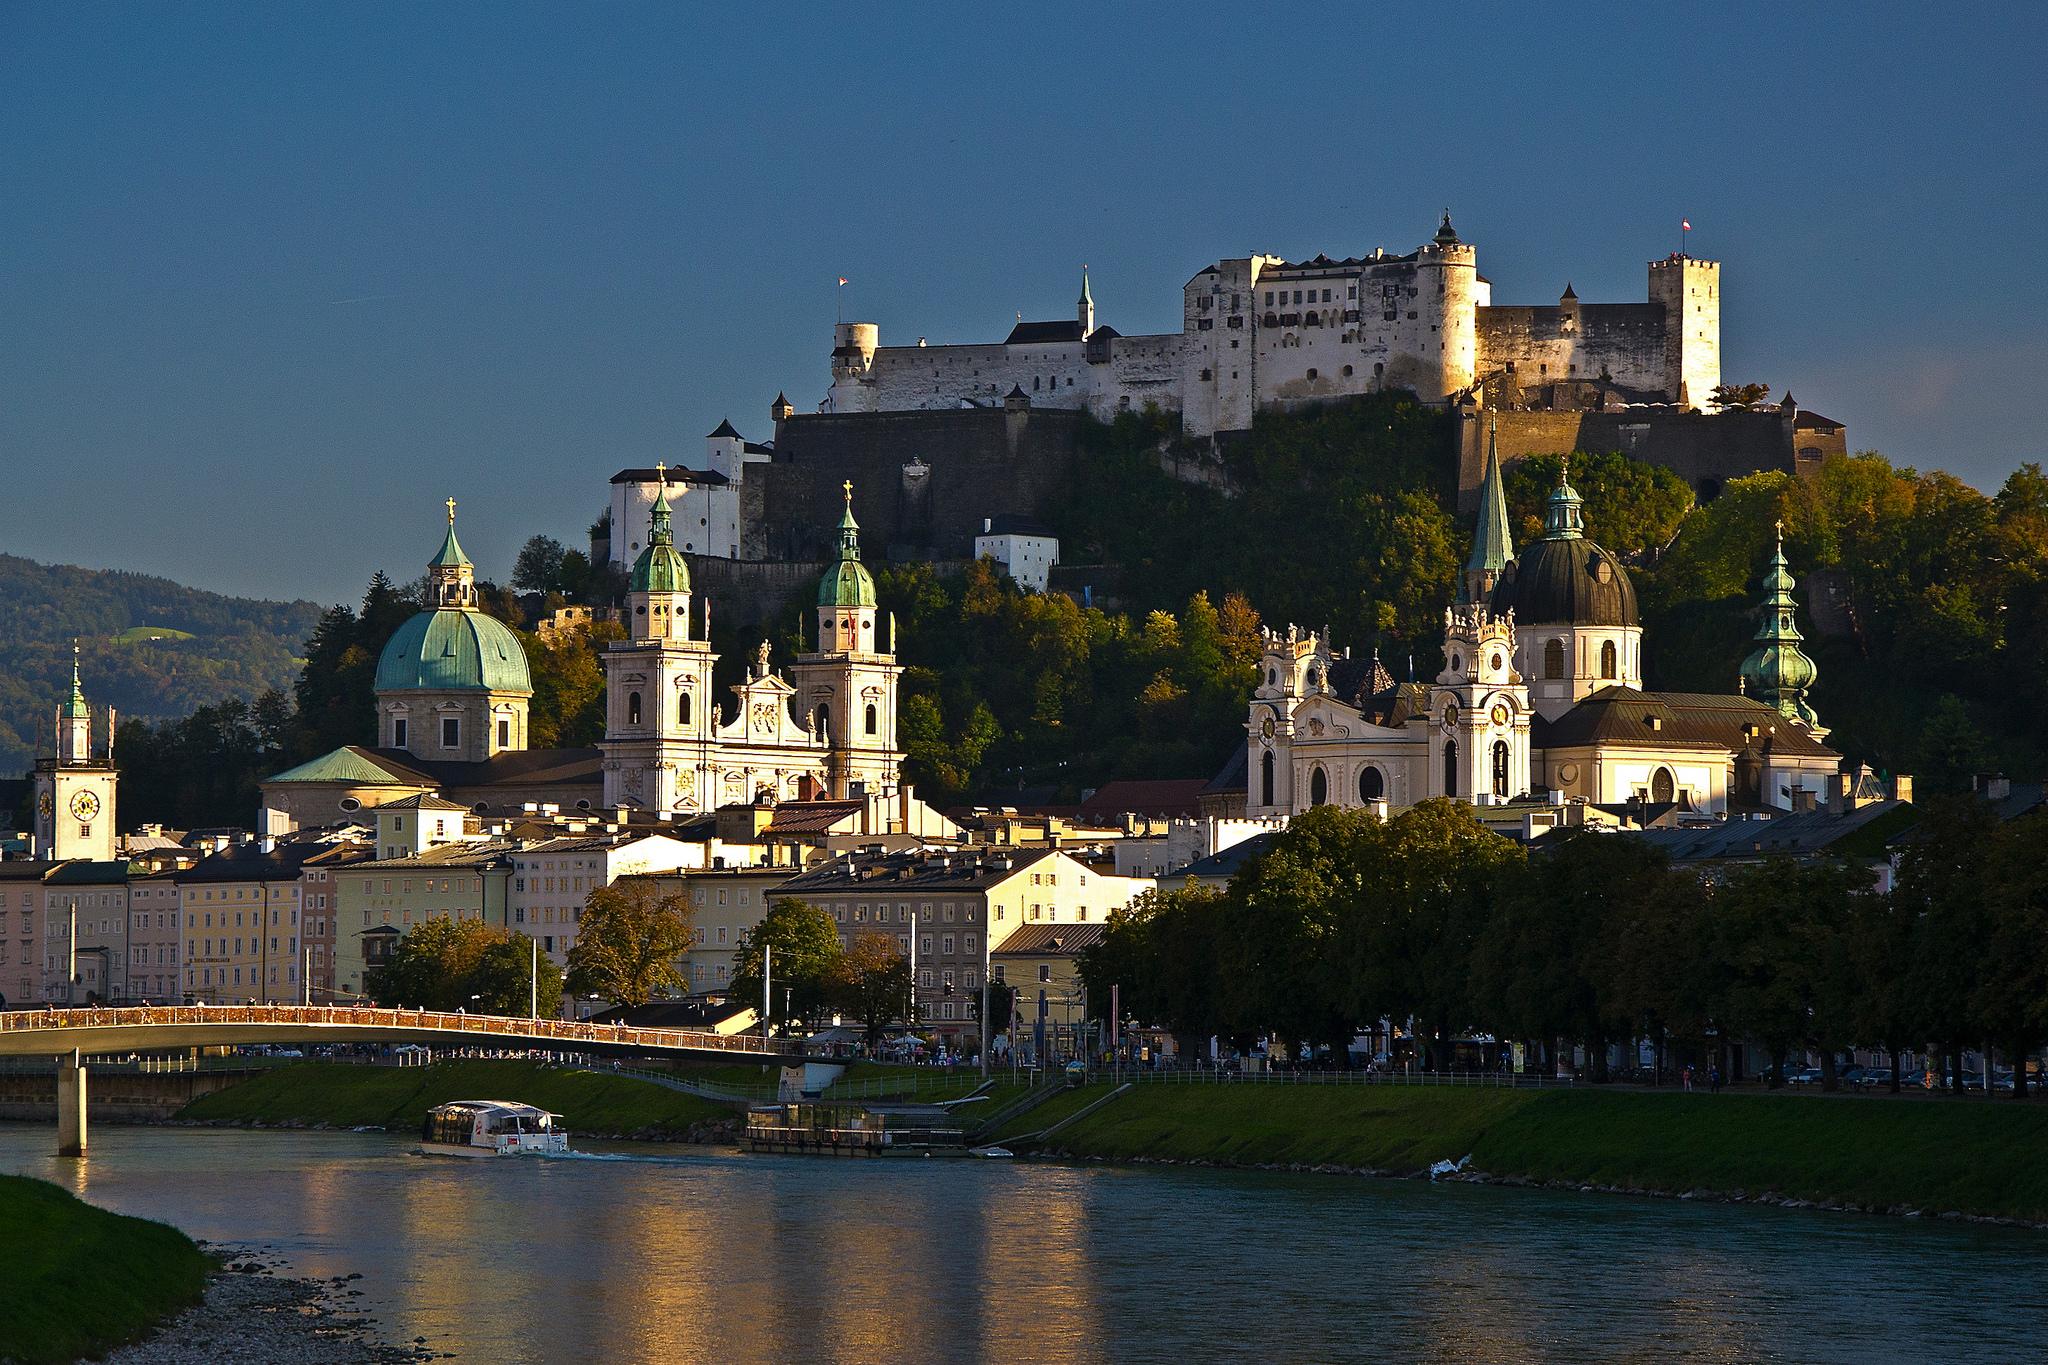 Railjet ferrovie austriache - Salisburgo Salzburg credits Eric Chumachenco via Flickr